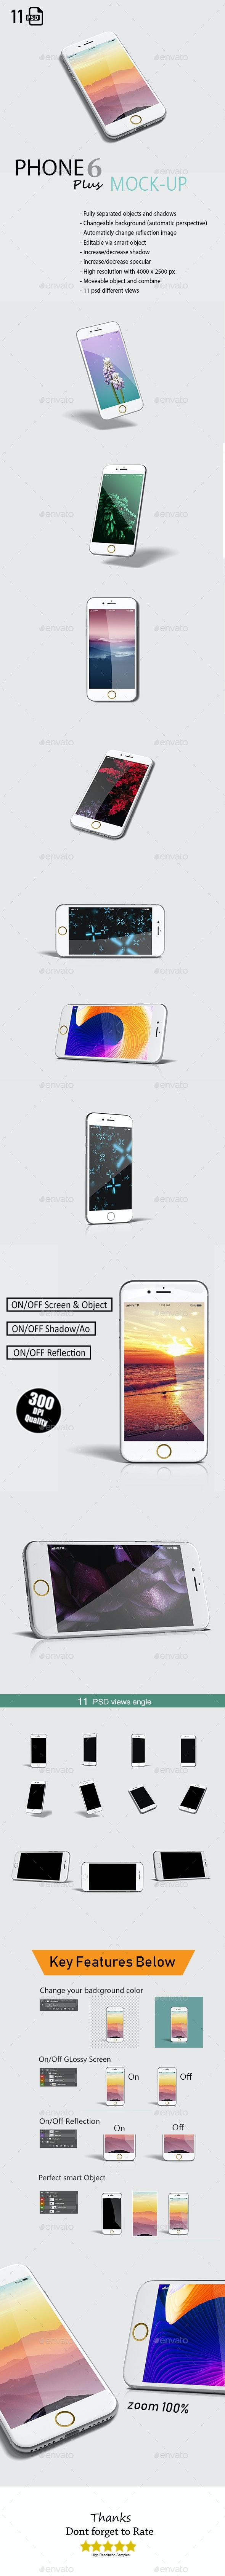 Phone 6 Plus App Mock-Up - Mobile Displays